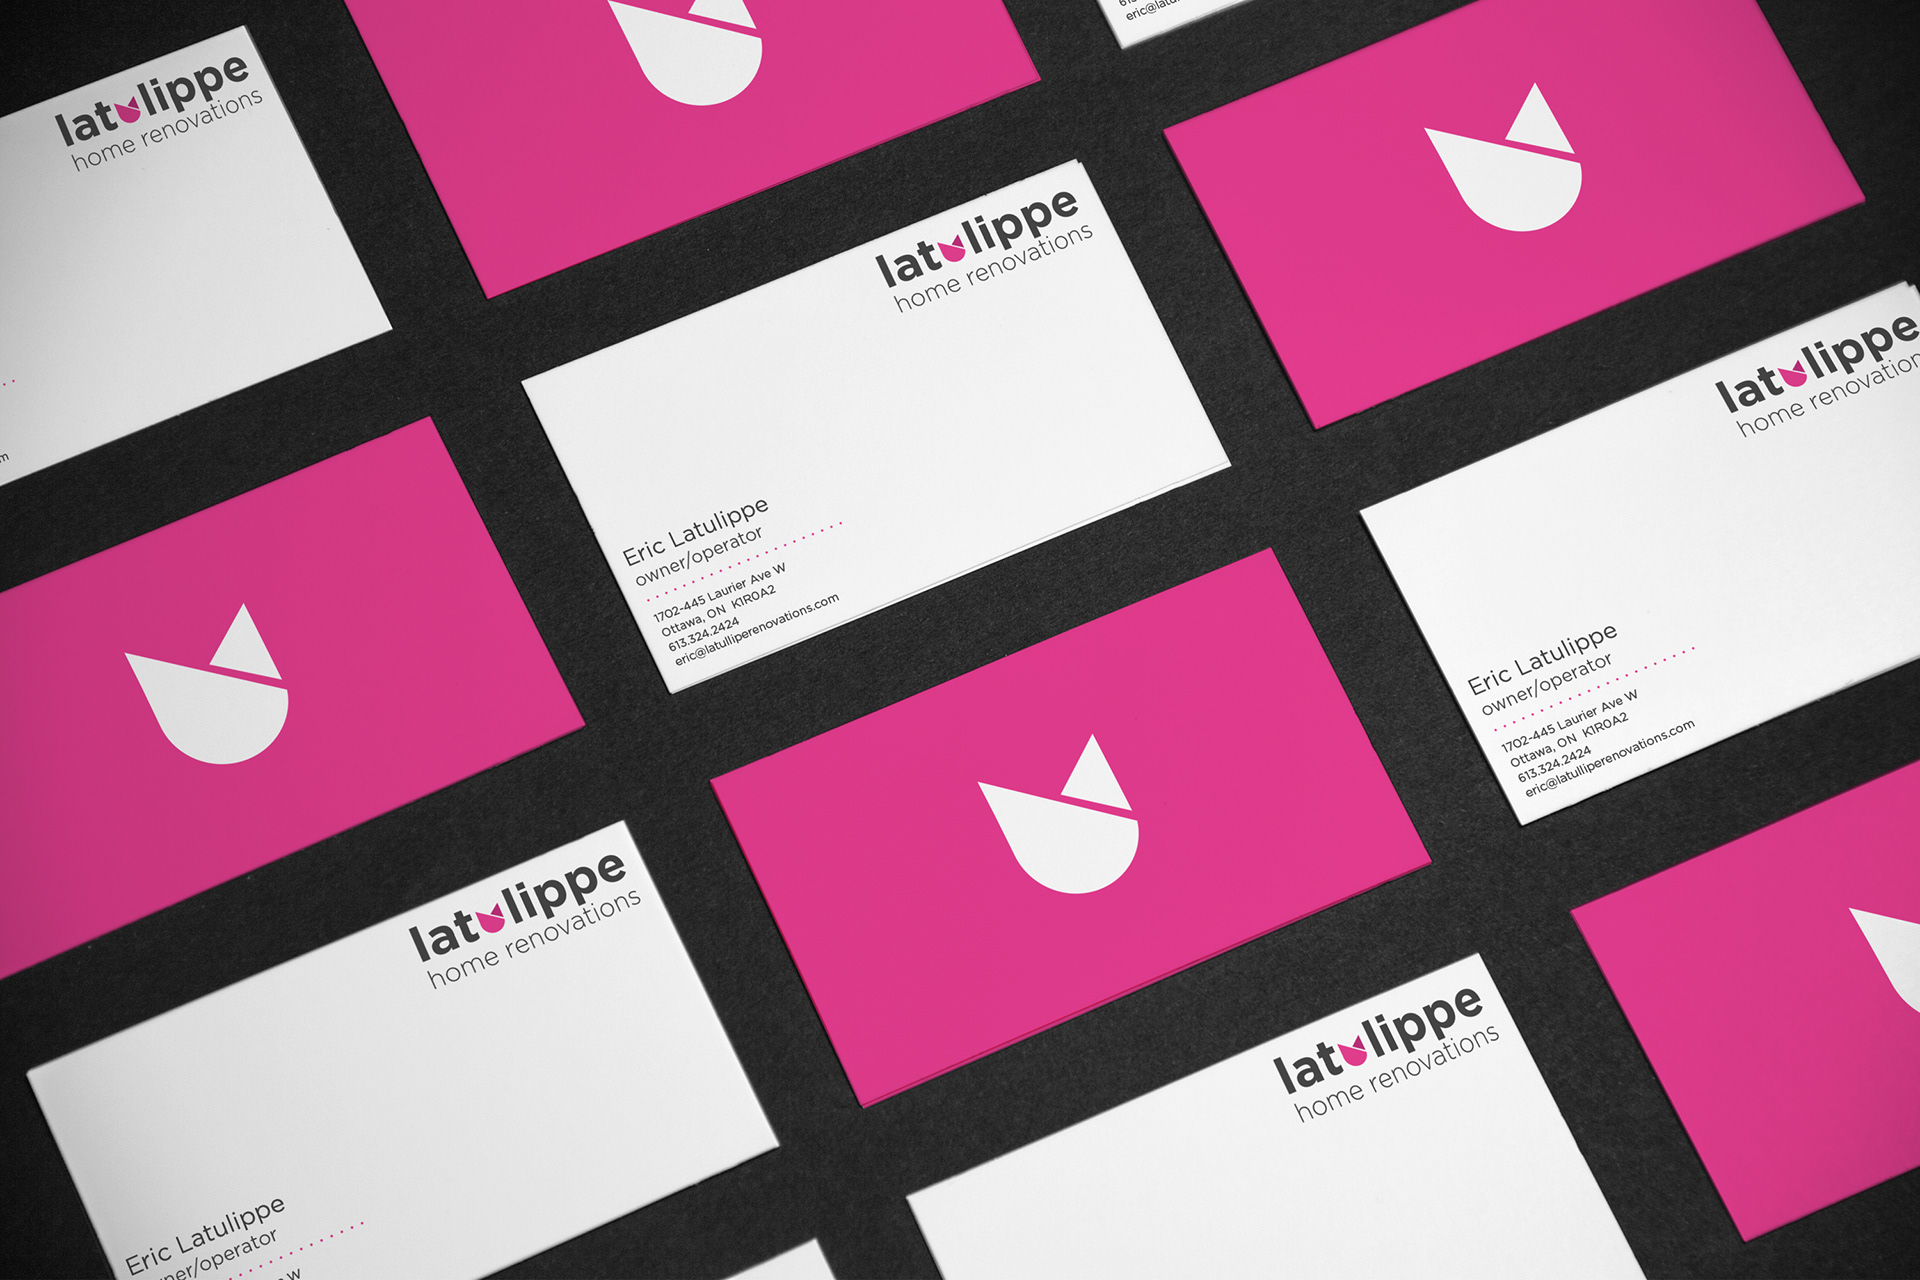 Ian durkin latulippe home renovation rebrand rebrand of latulippe home renovations logo business cards colourmoves